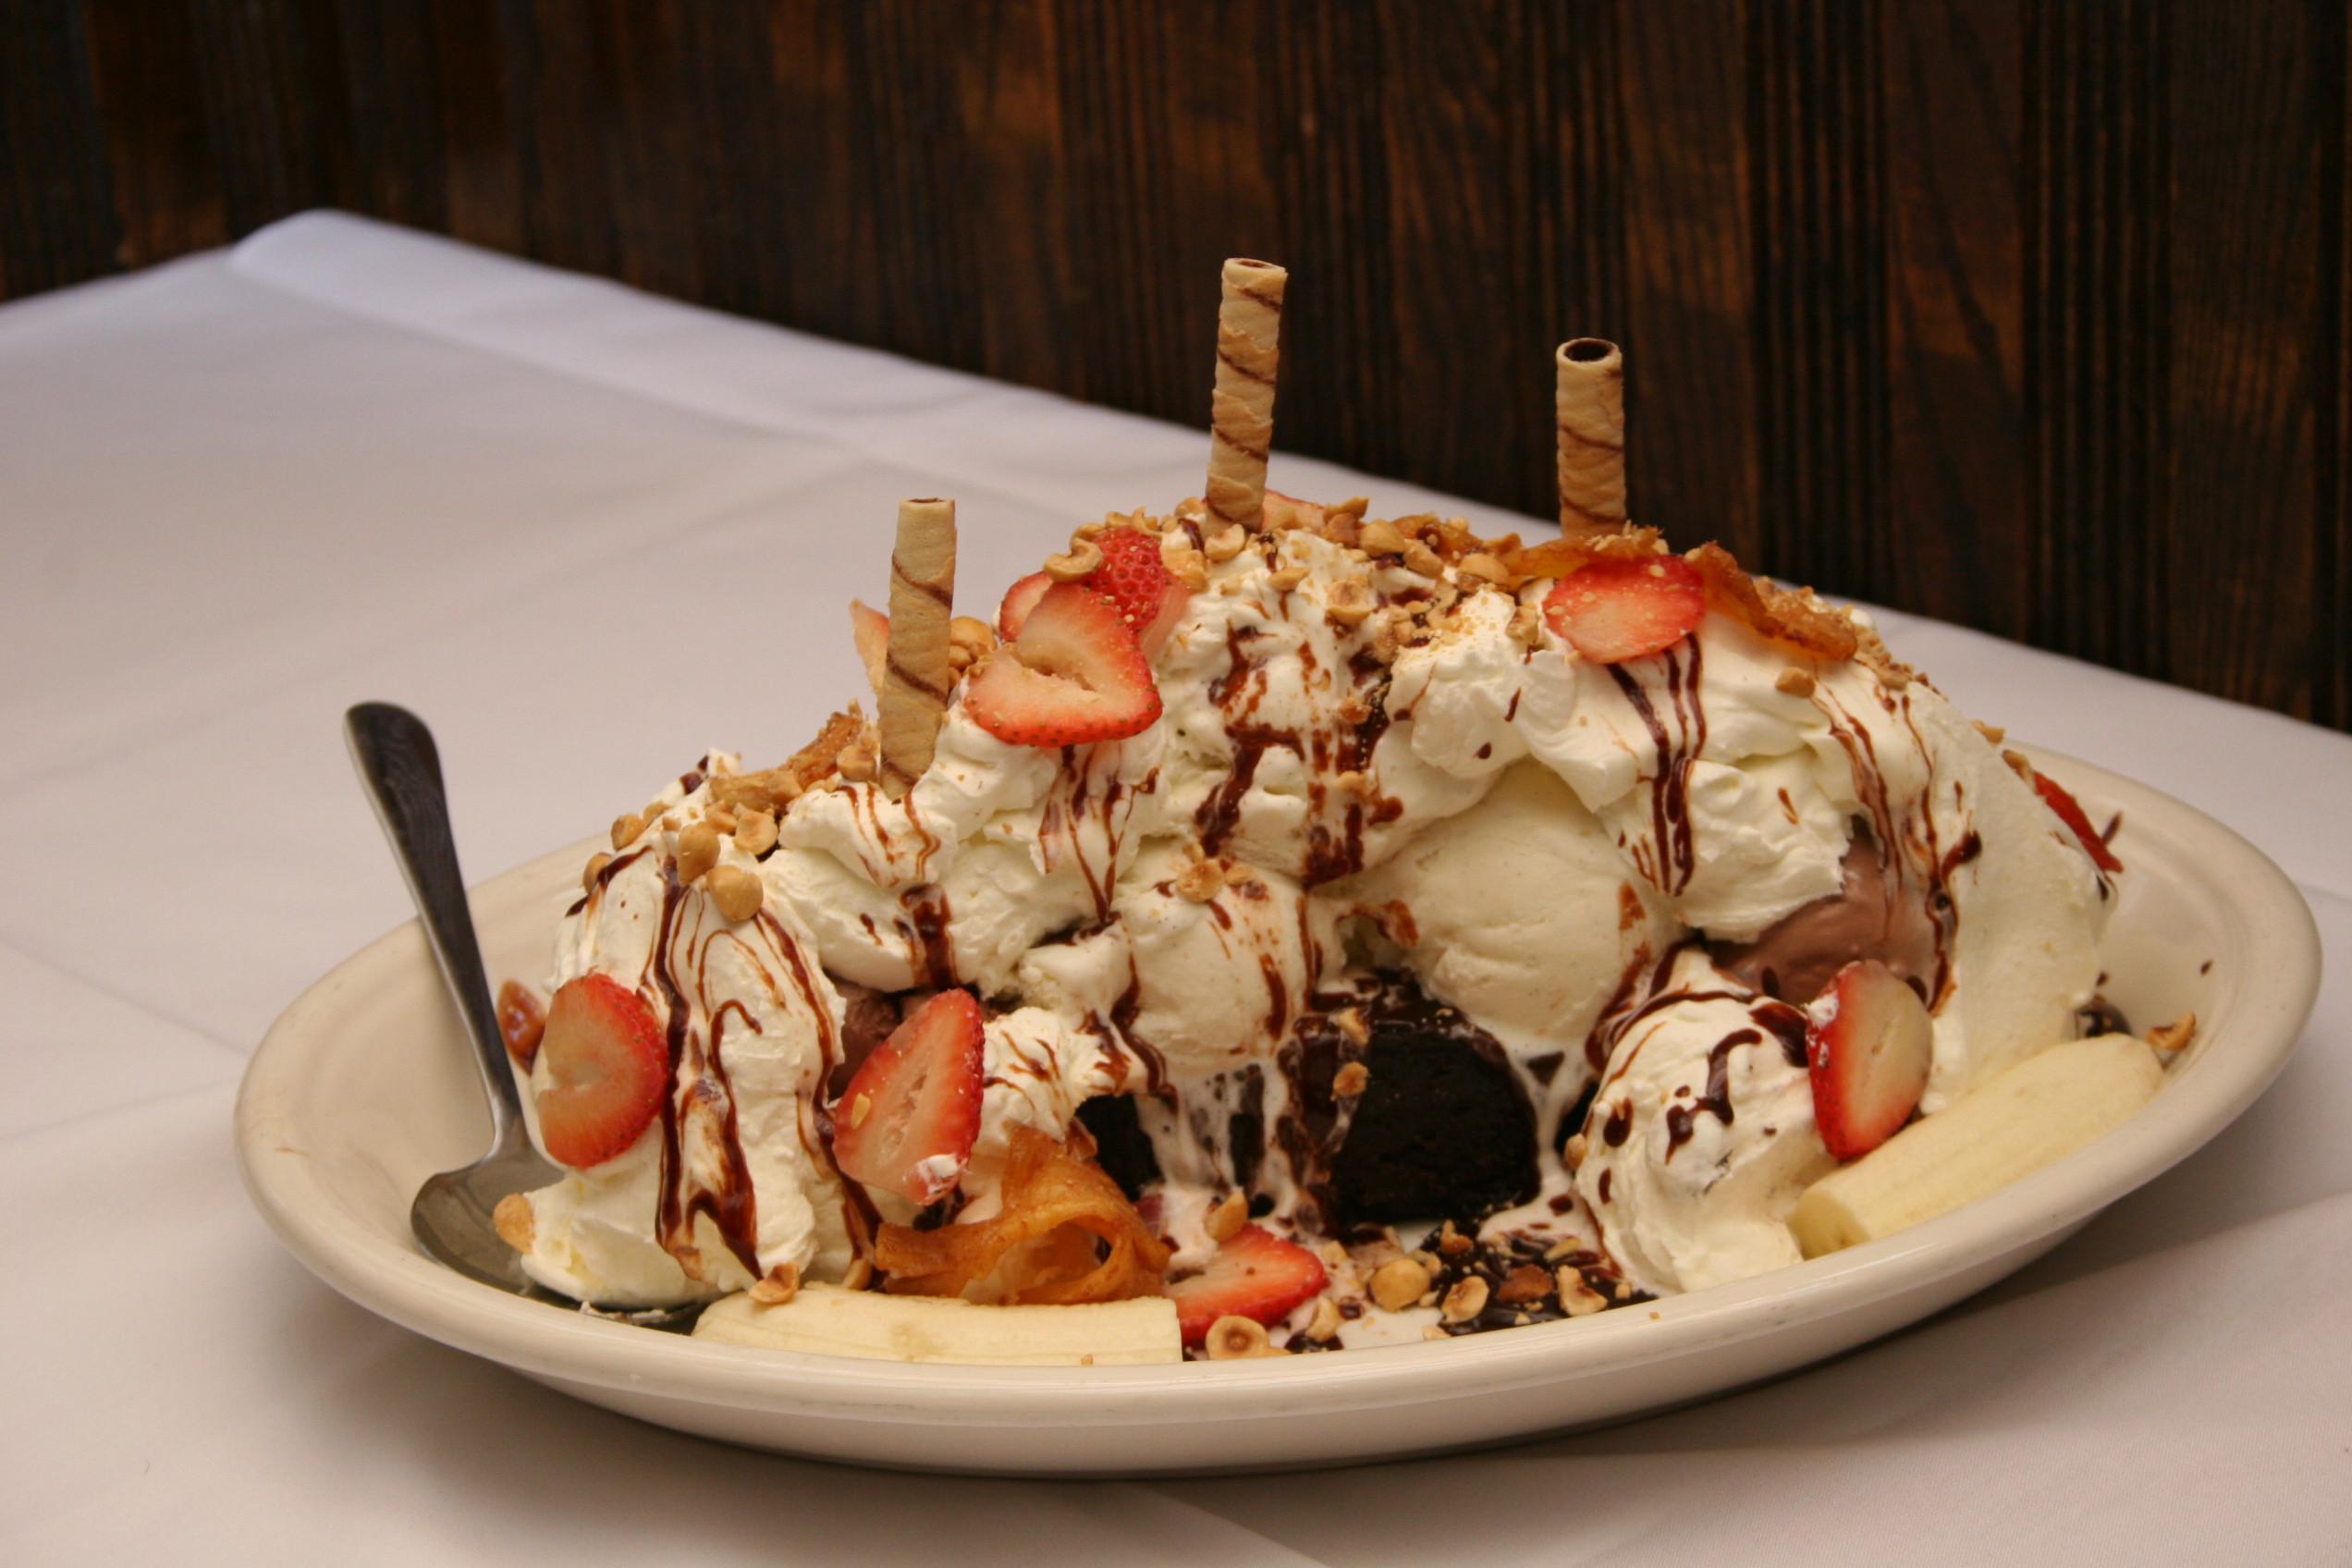 Healthy Desserts Nyc  Titanic at Carmine's CBS New York